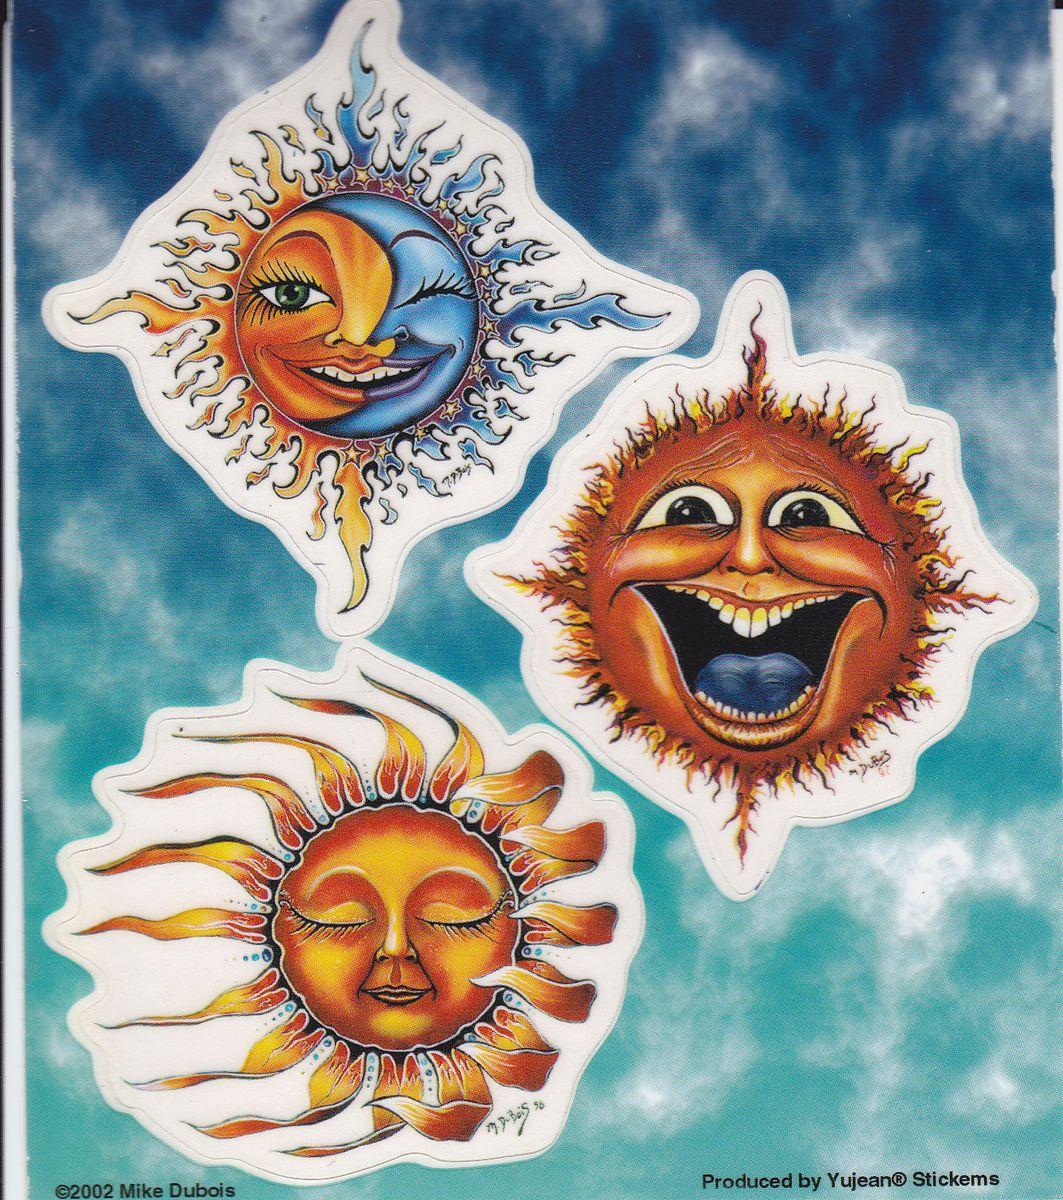 Dubois sun multipack vinyl car decal decals stickers sticker